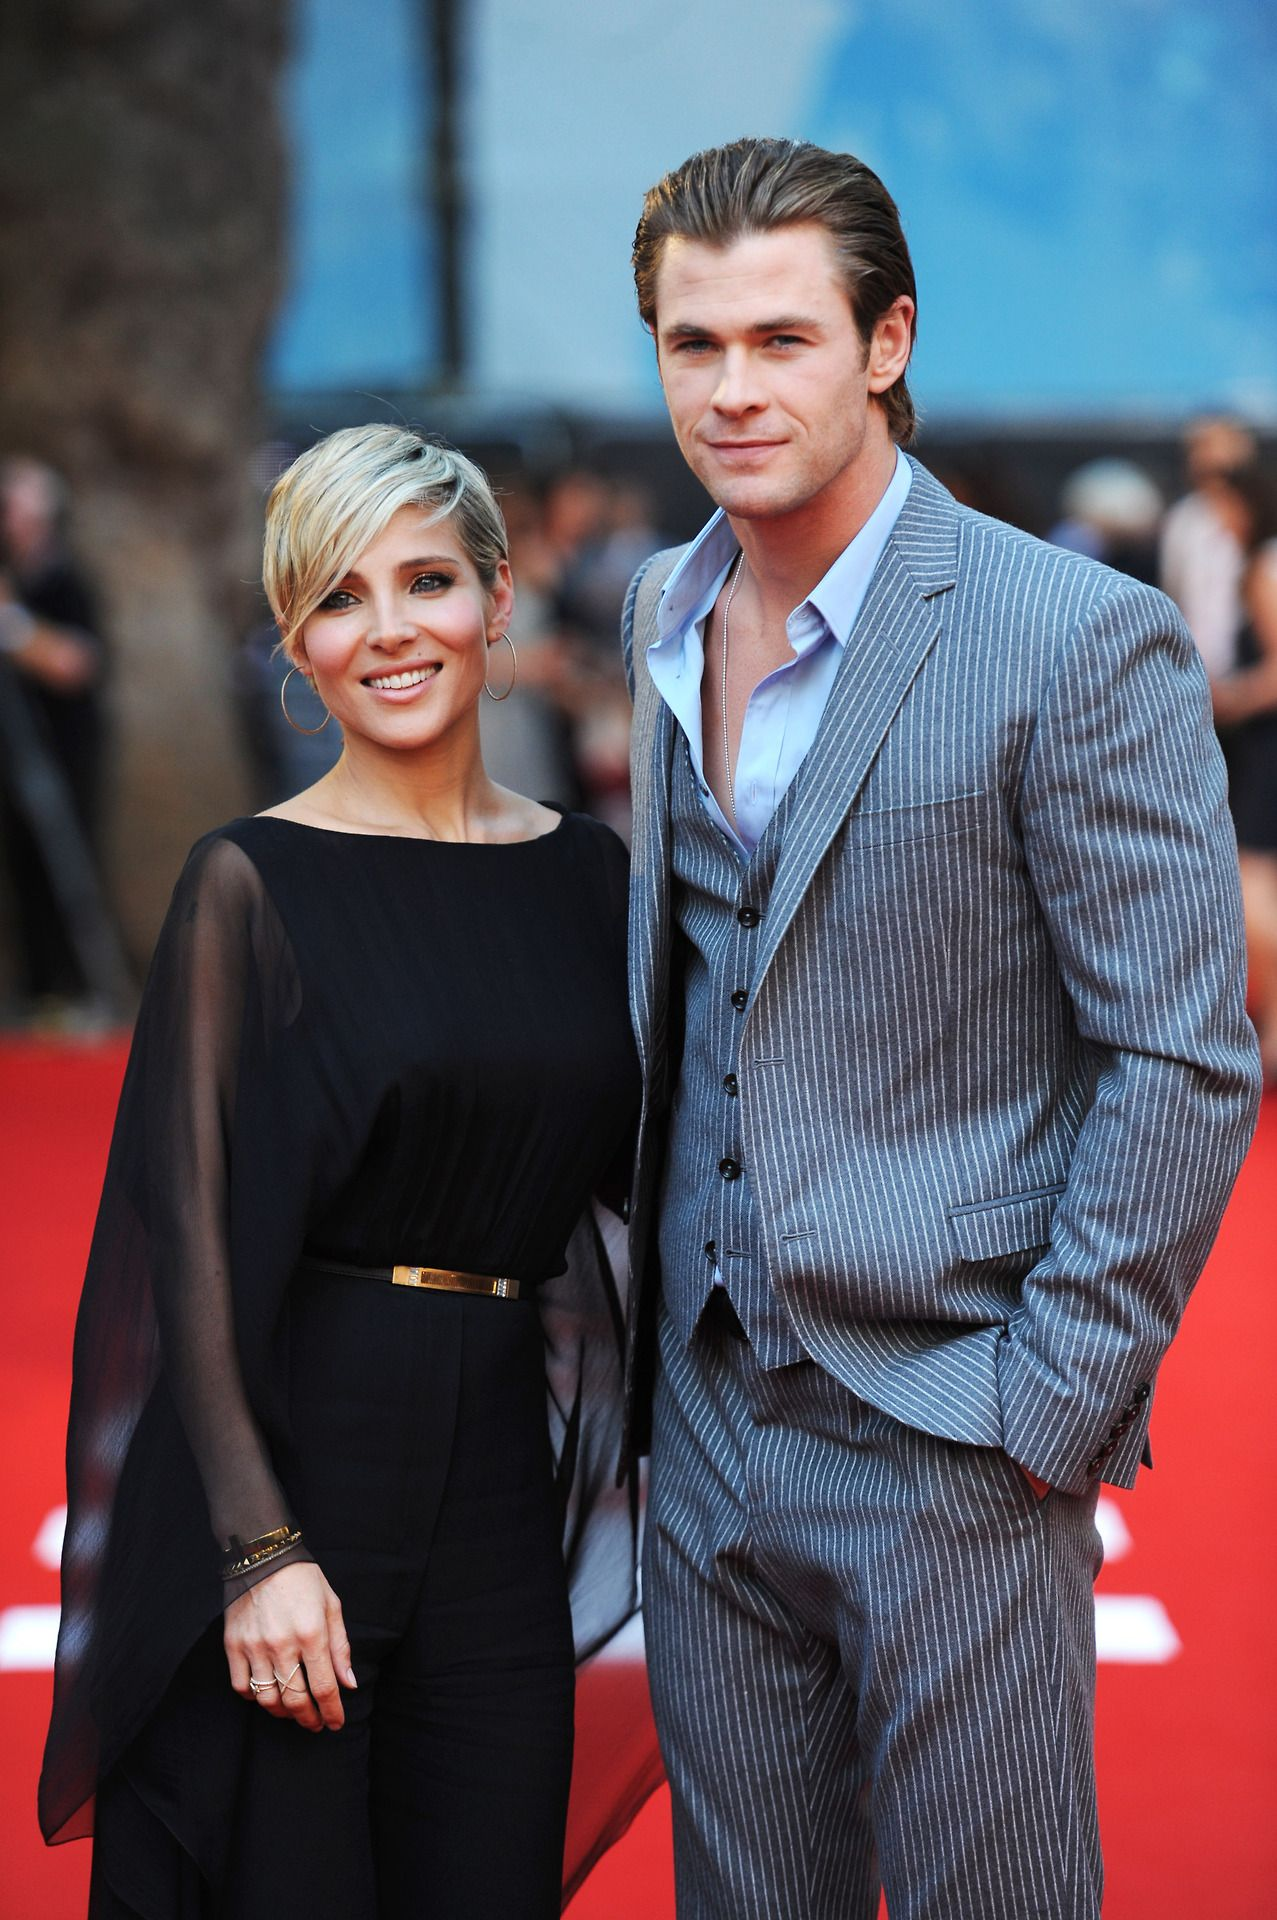 Chris Hemsworth and Wife Elsa Pataky Favorite Actors